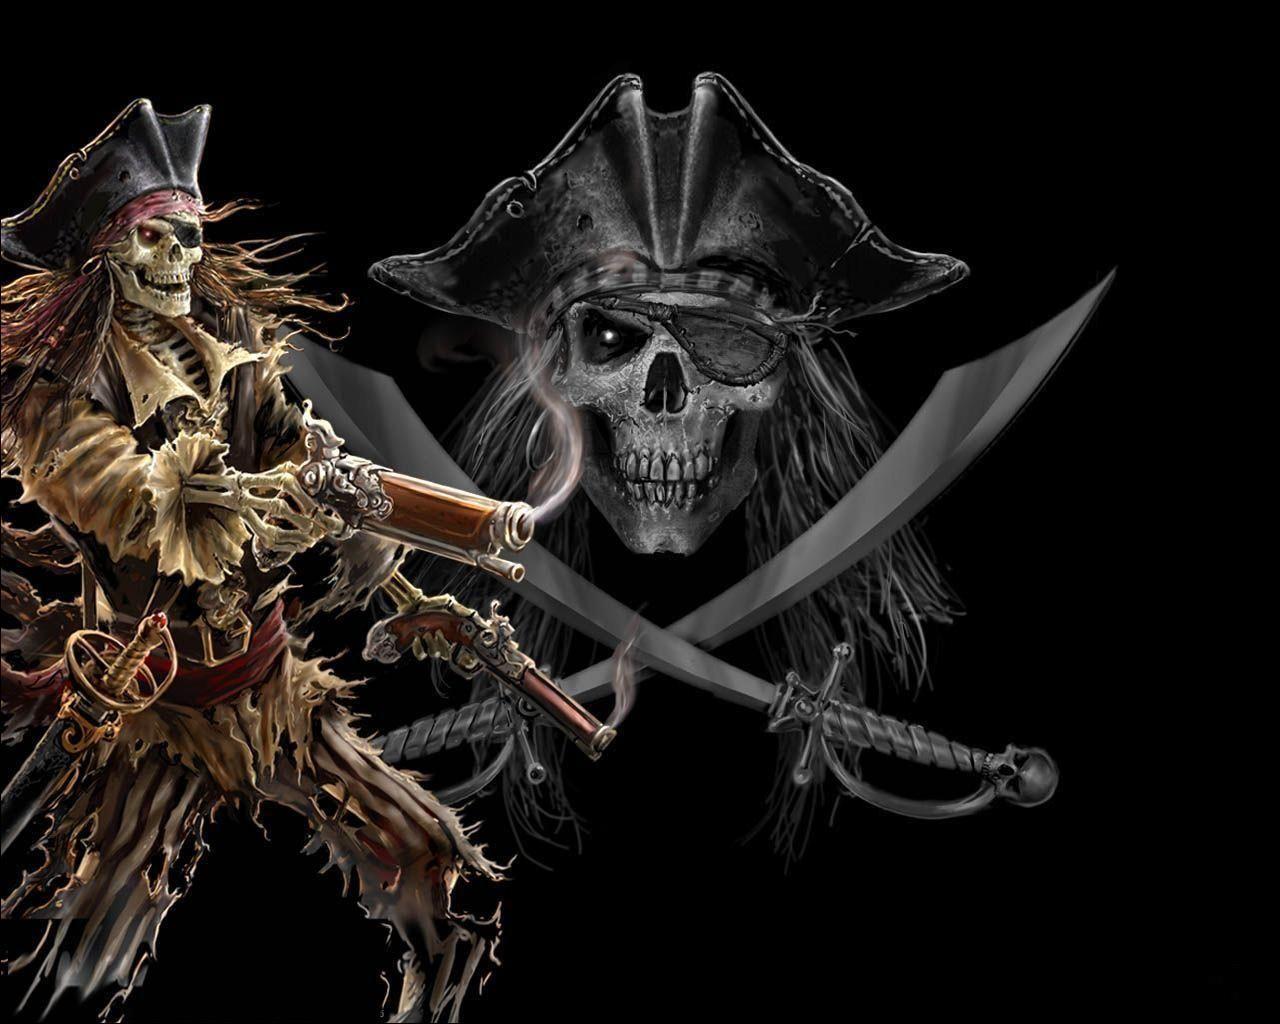 pirate Dark Skeleton Pirate wallpaper from Skulls